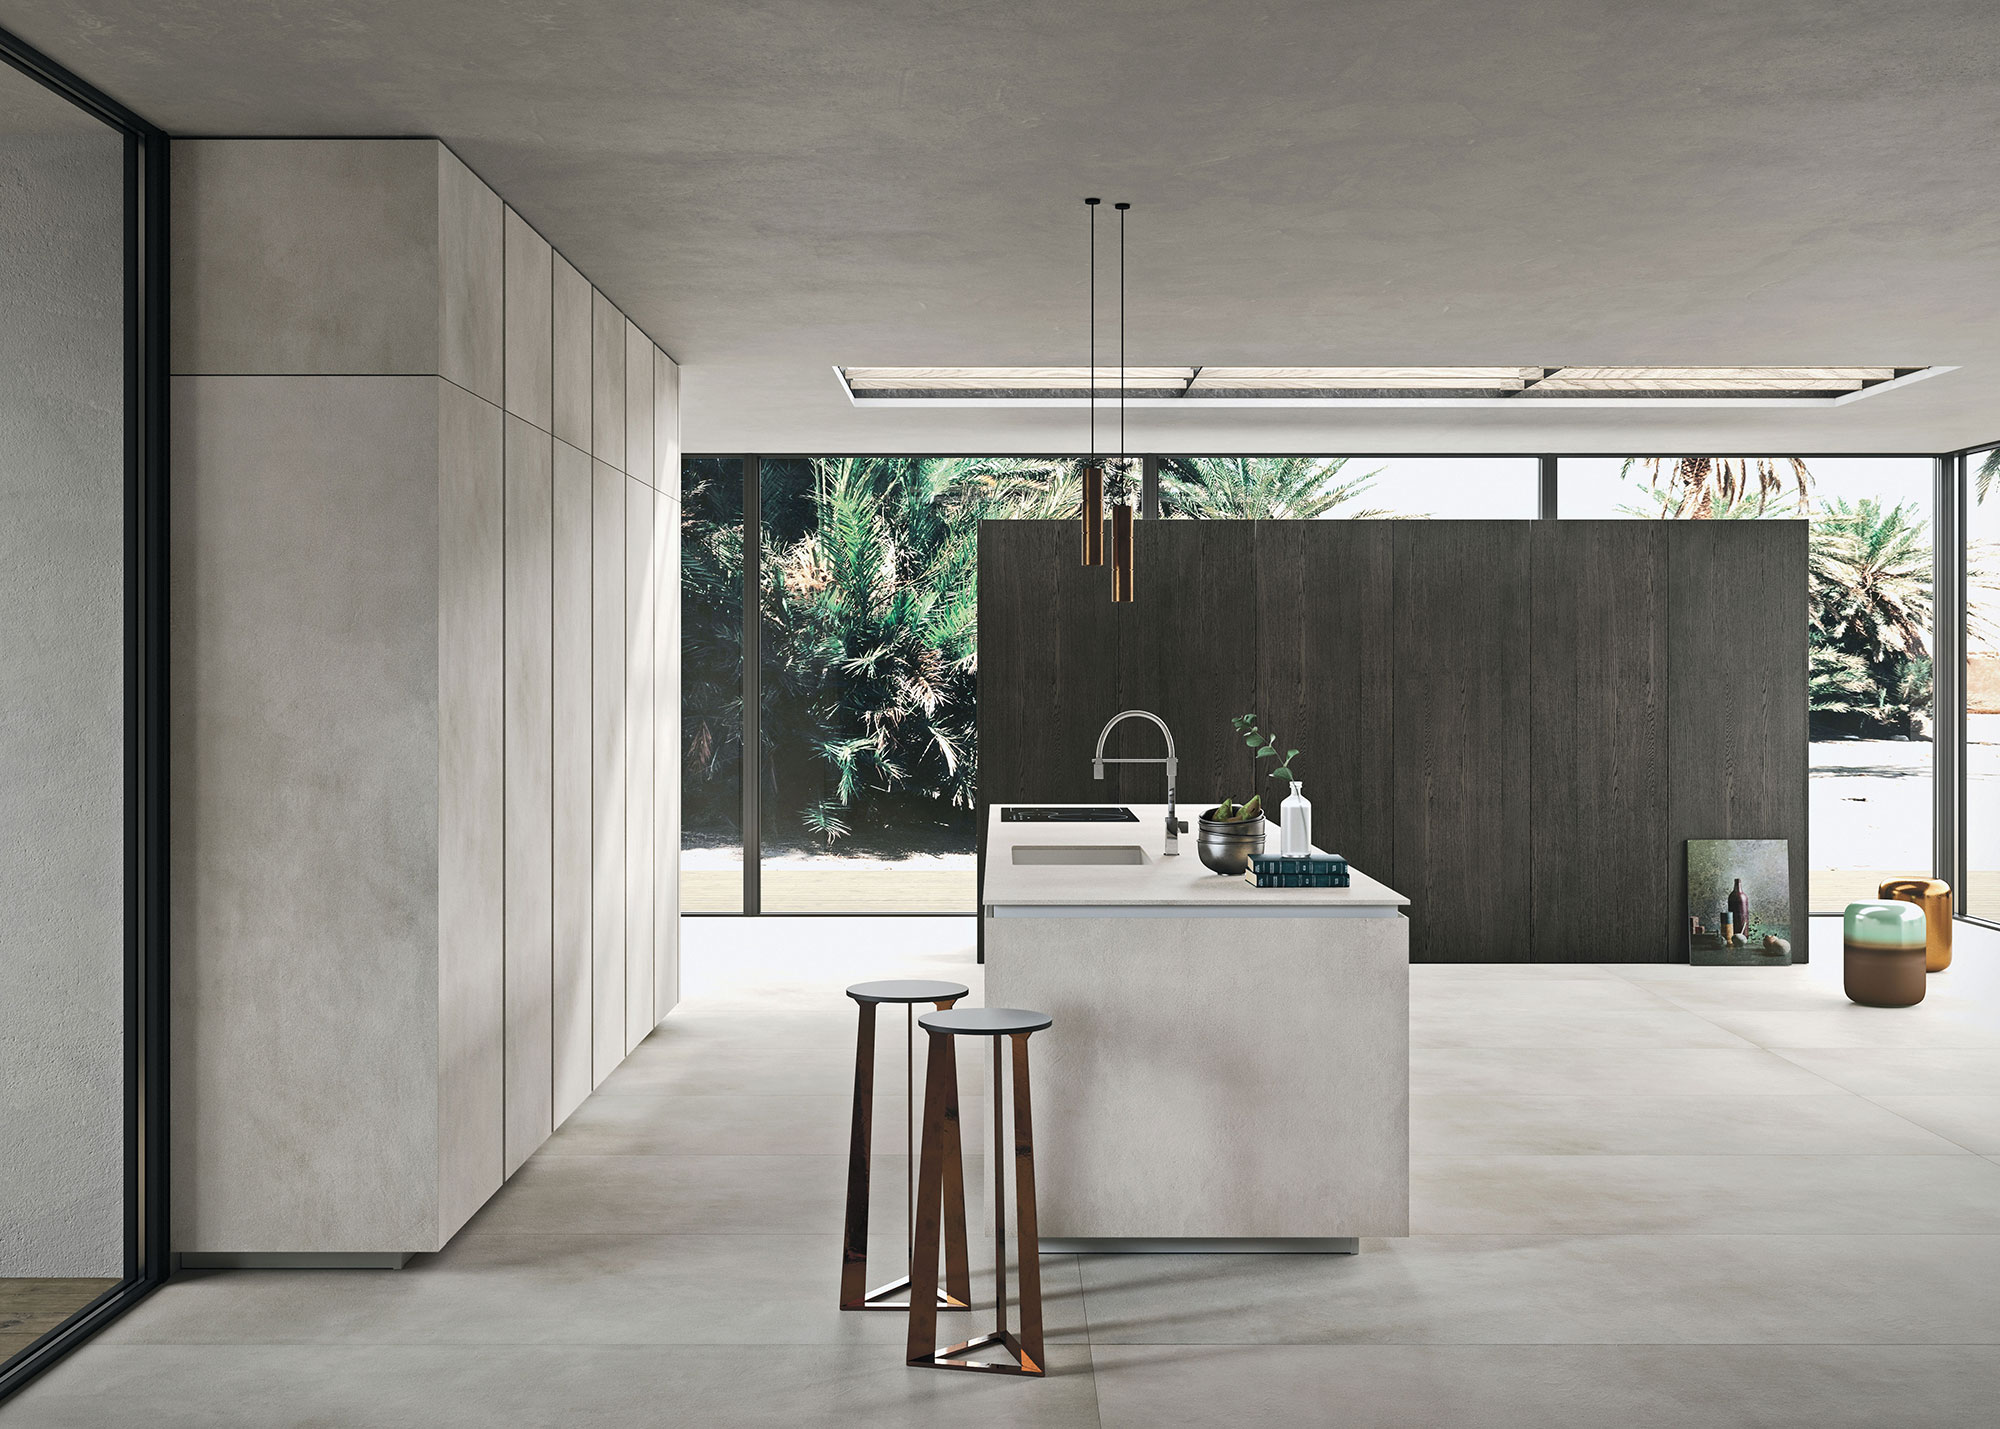 Italiaanse designkeuken Snaidero Way Materia. Moderne greeploze keuken in lichte kleur kalk 'calce' grijs #design #designkeuken #snaidero #madeinitaly #keuken